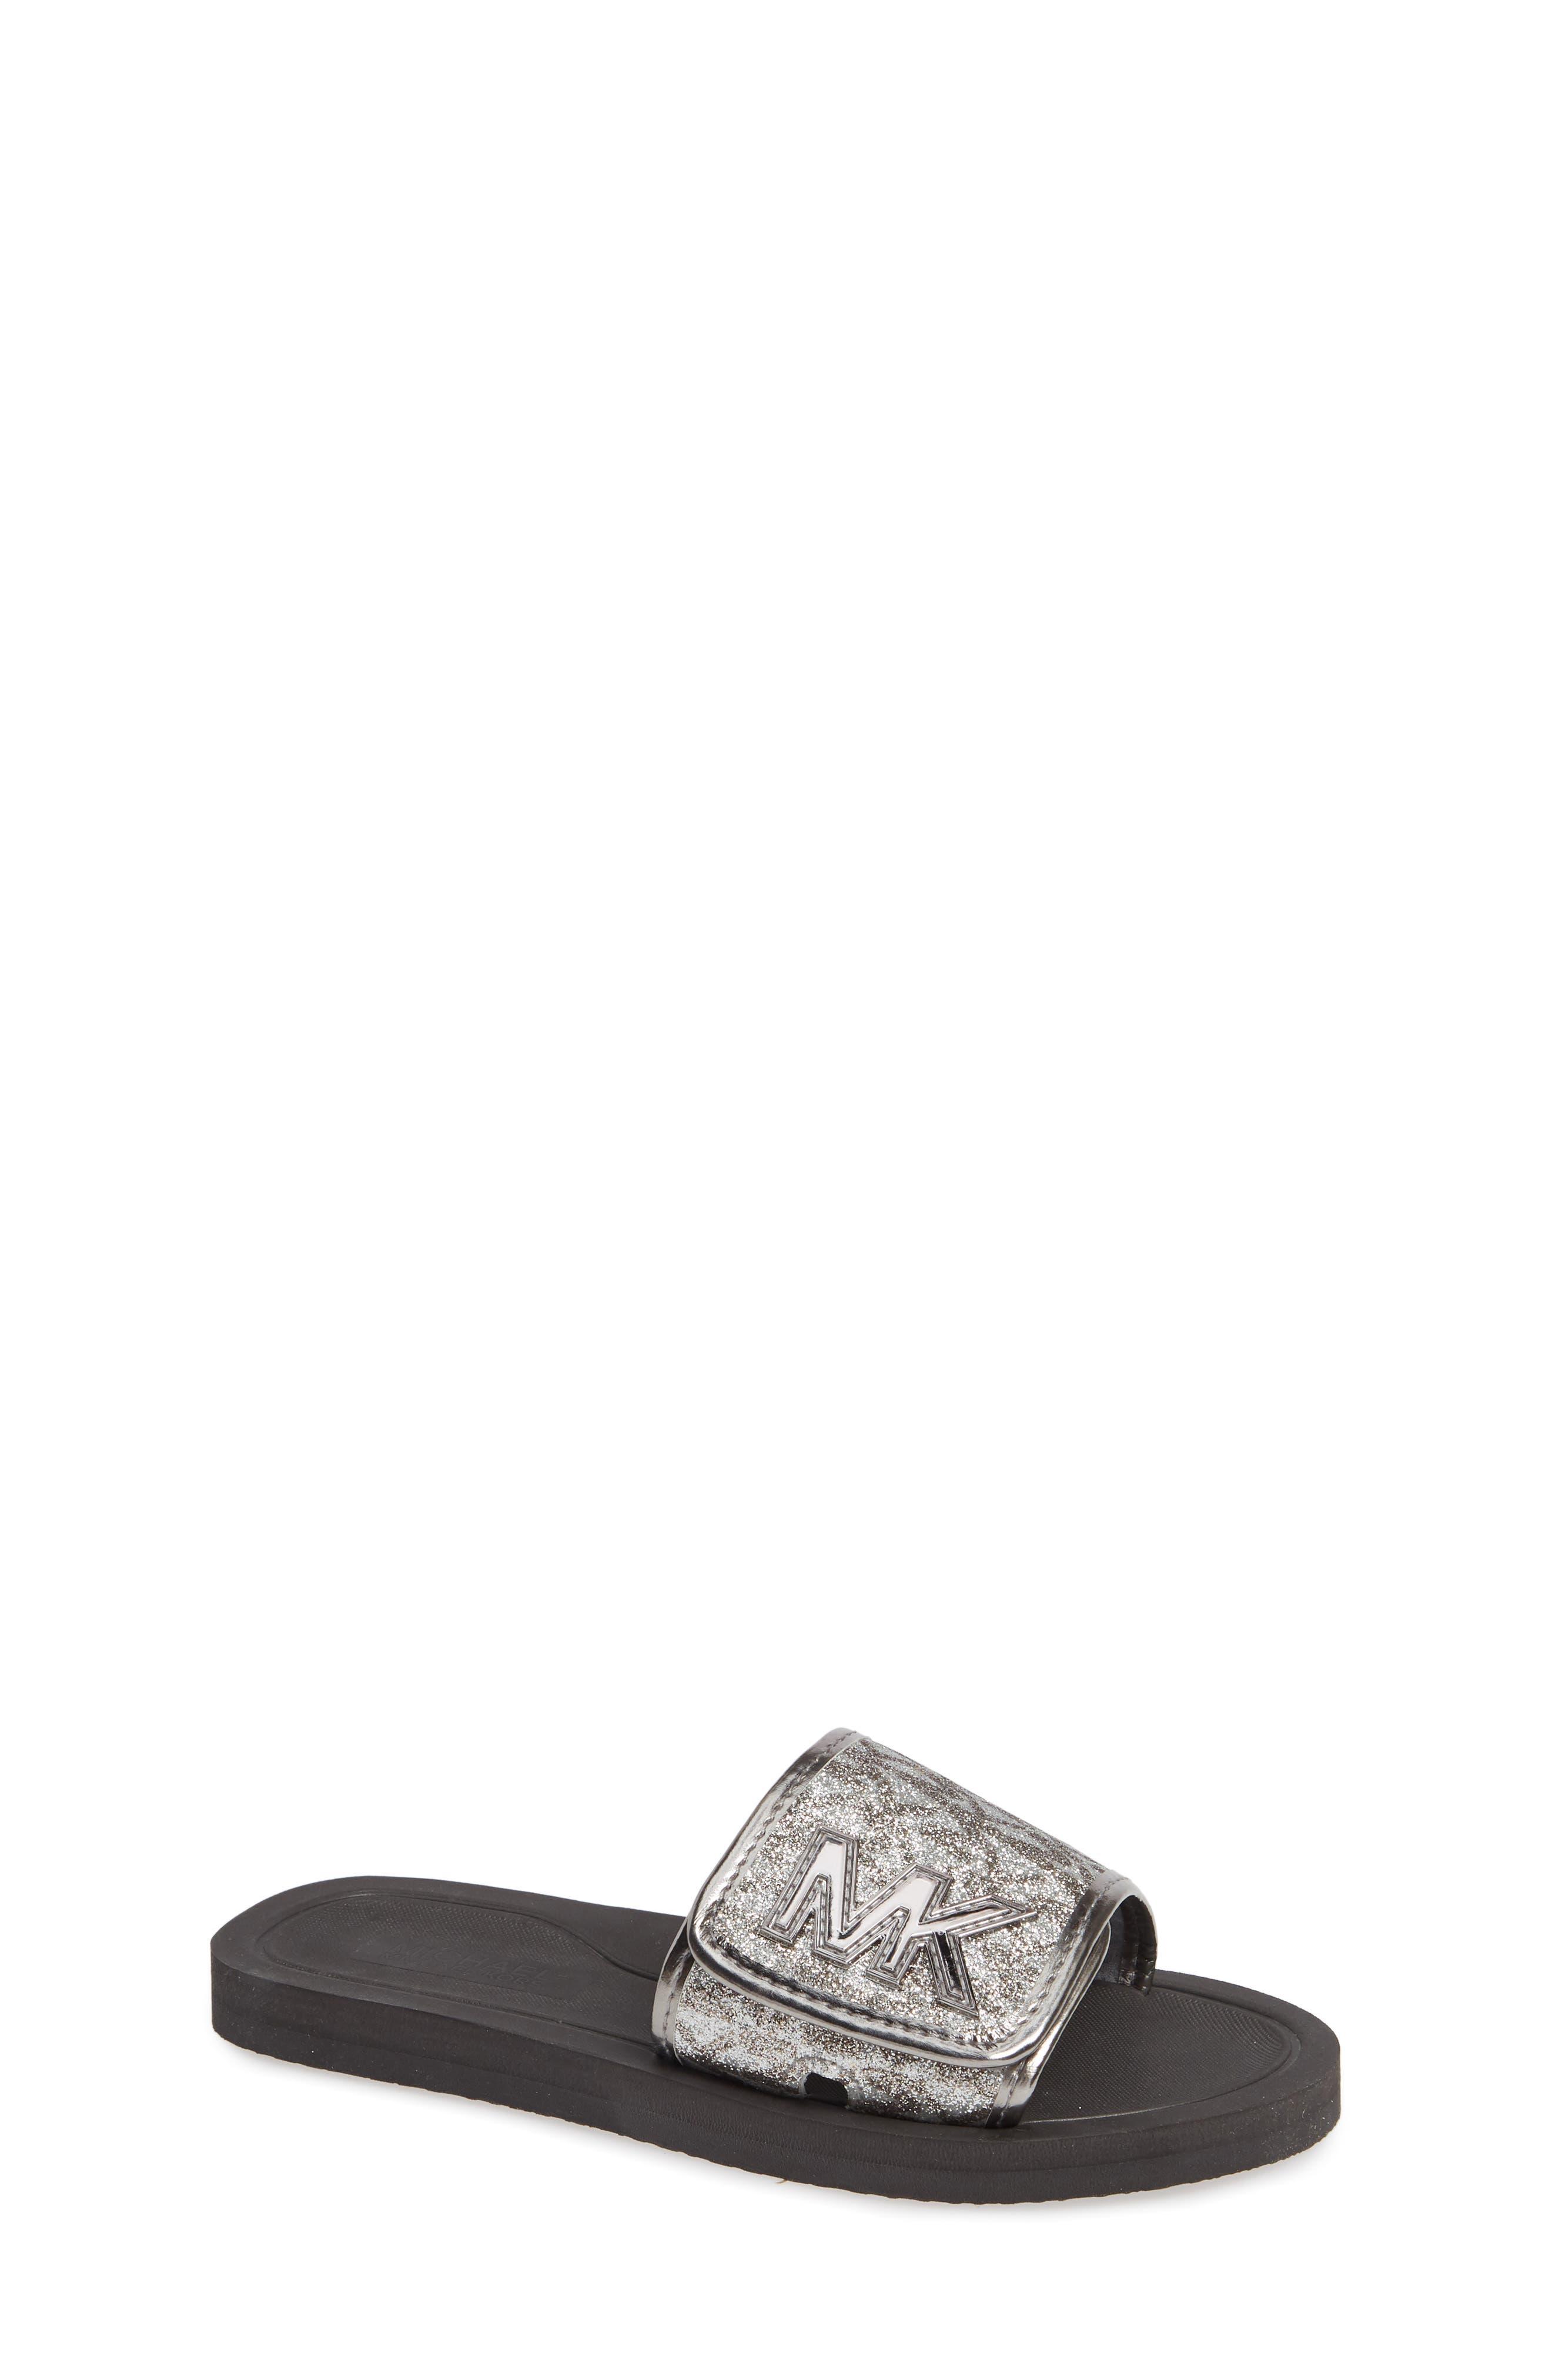 MICHAEL MICHAEL KORS Eli Seneca Glitter Slide Sandal, Main, color, GUNMETAL